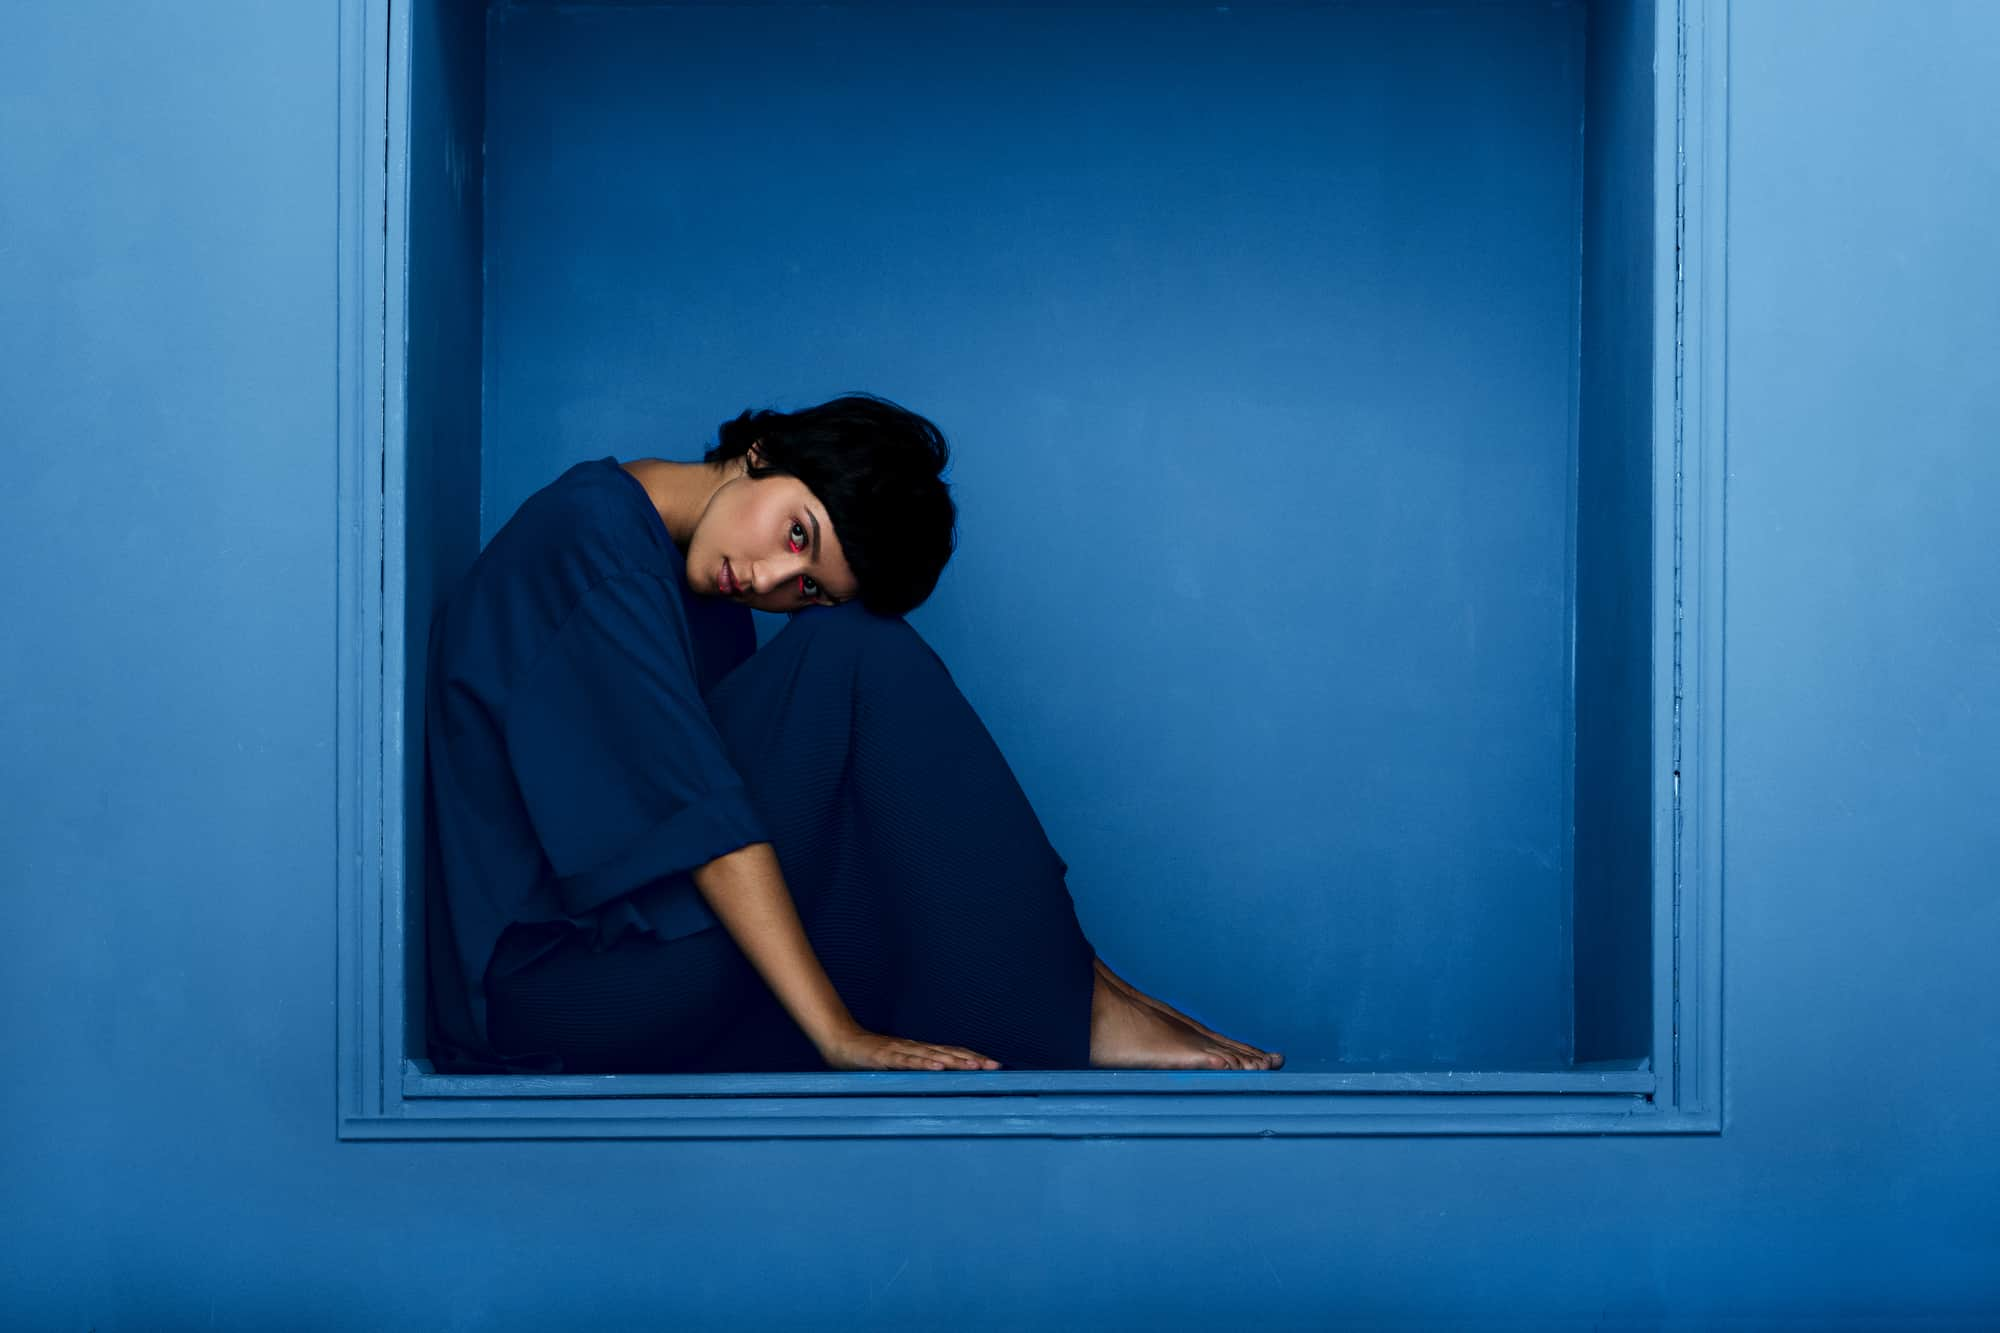 blue represents serenity, calmness, peace, and imagination